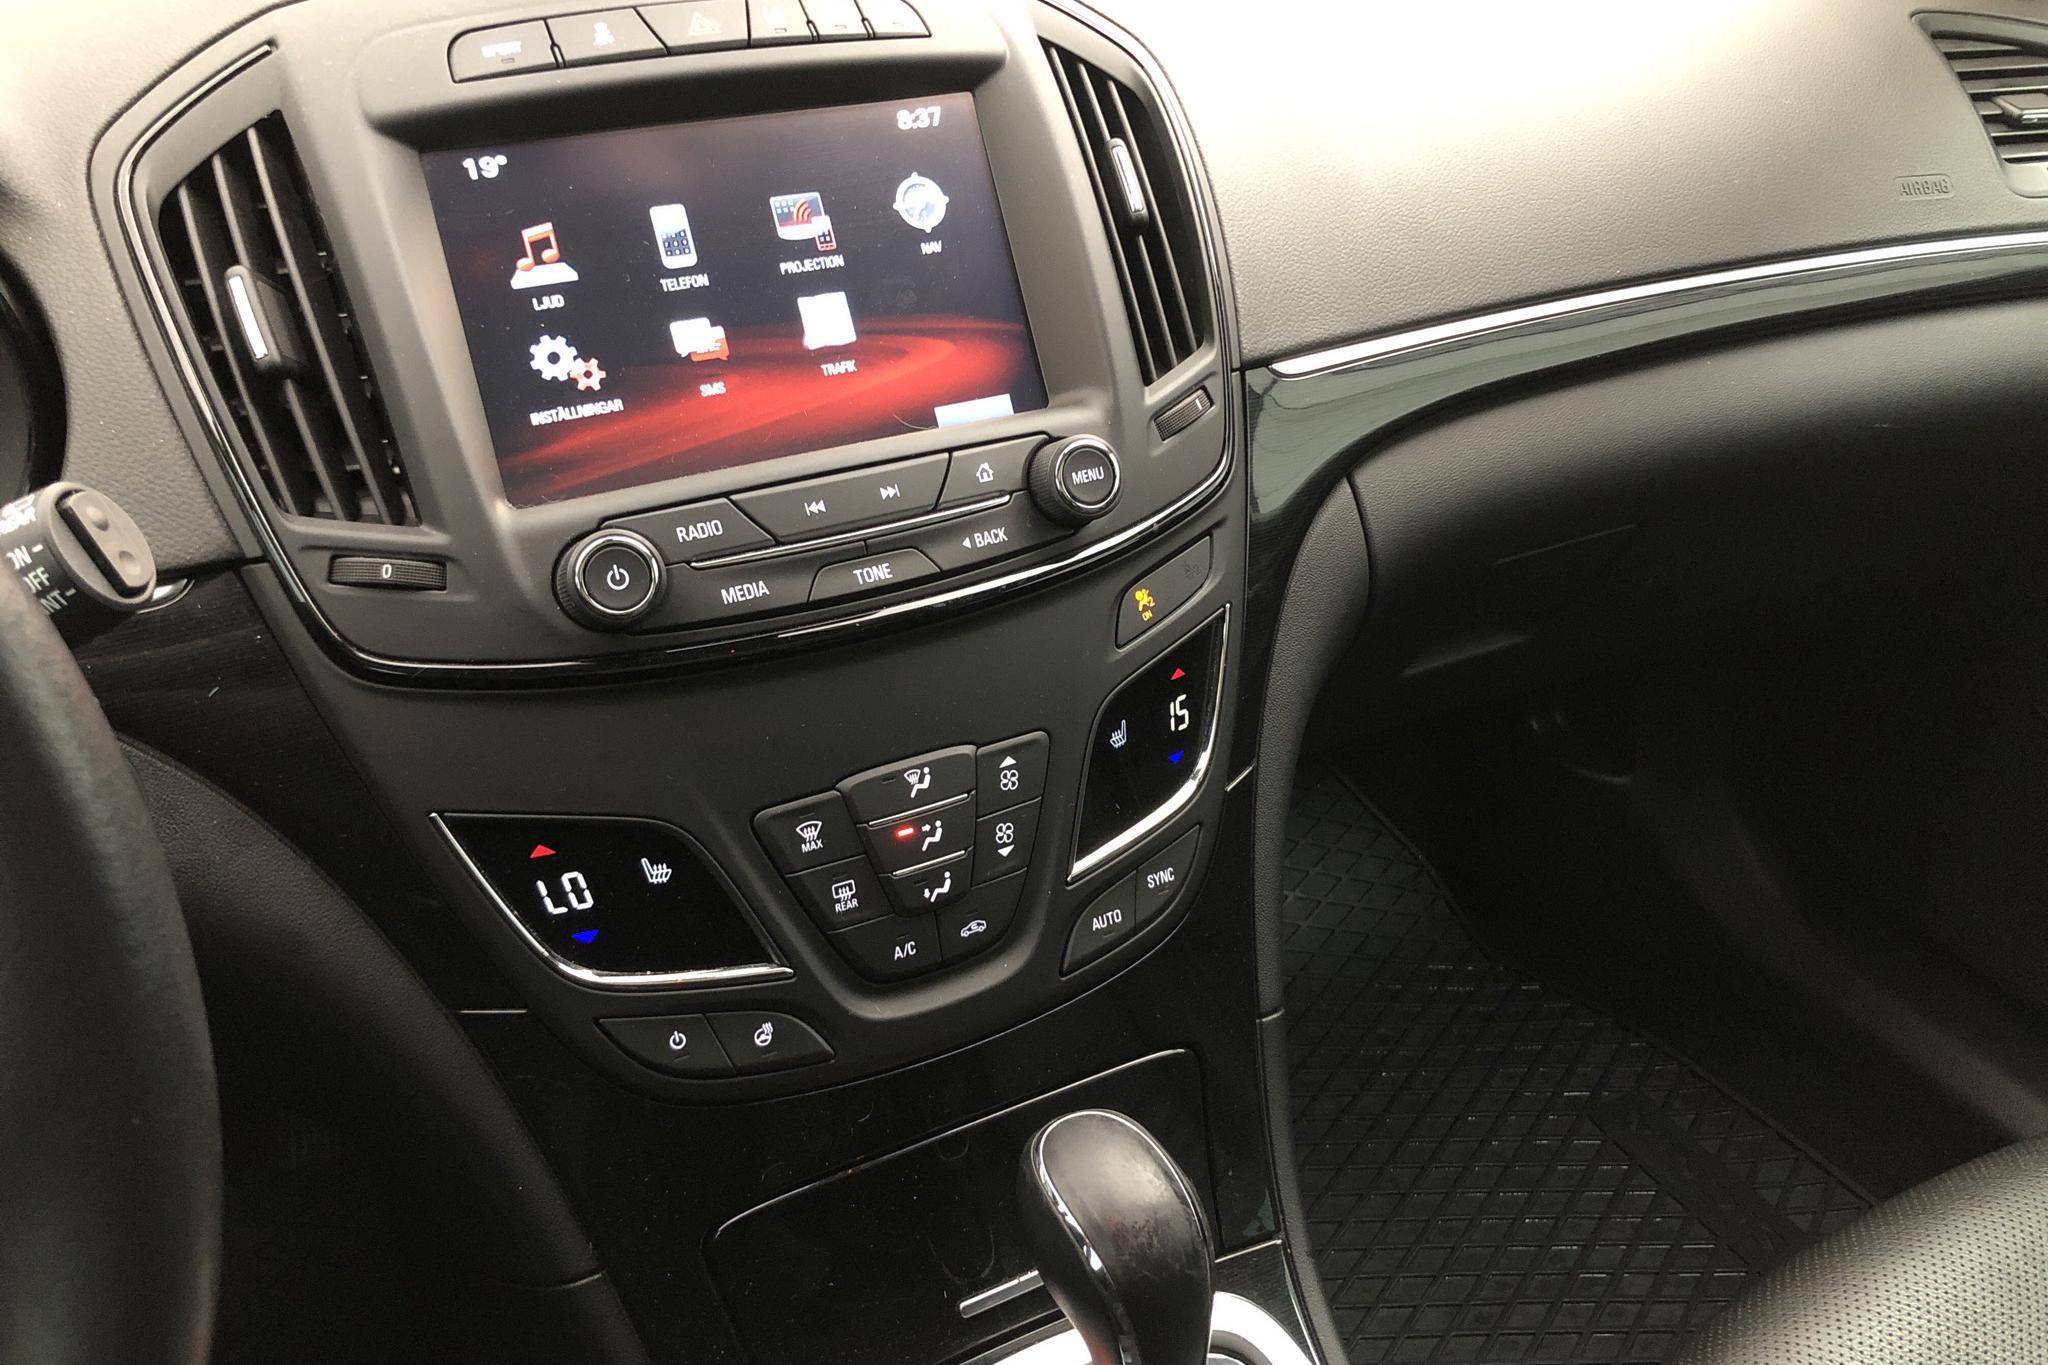 Opel Insignia 2.0 CDTI ECOTEC 4x4 Sports Tourer (170hk) - 0 mil - vit - 2017